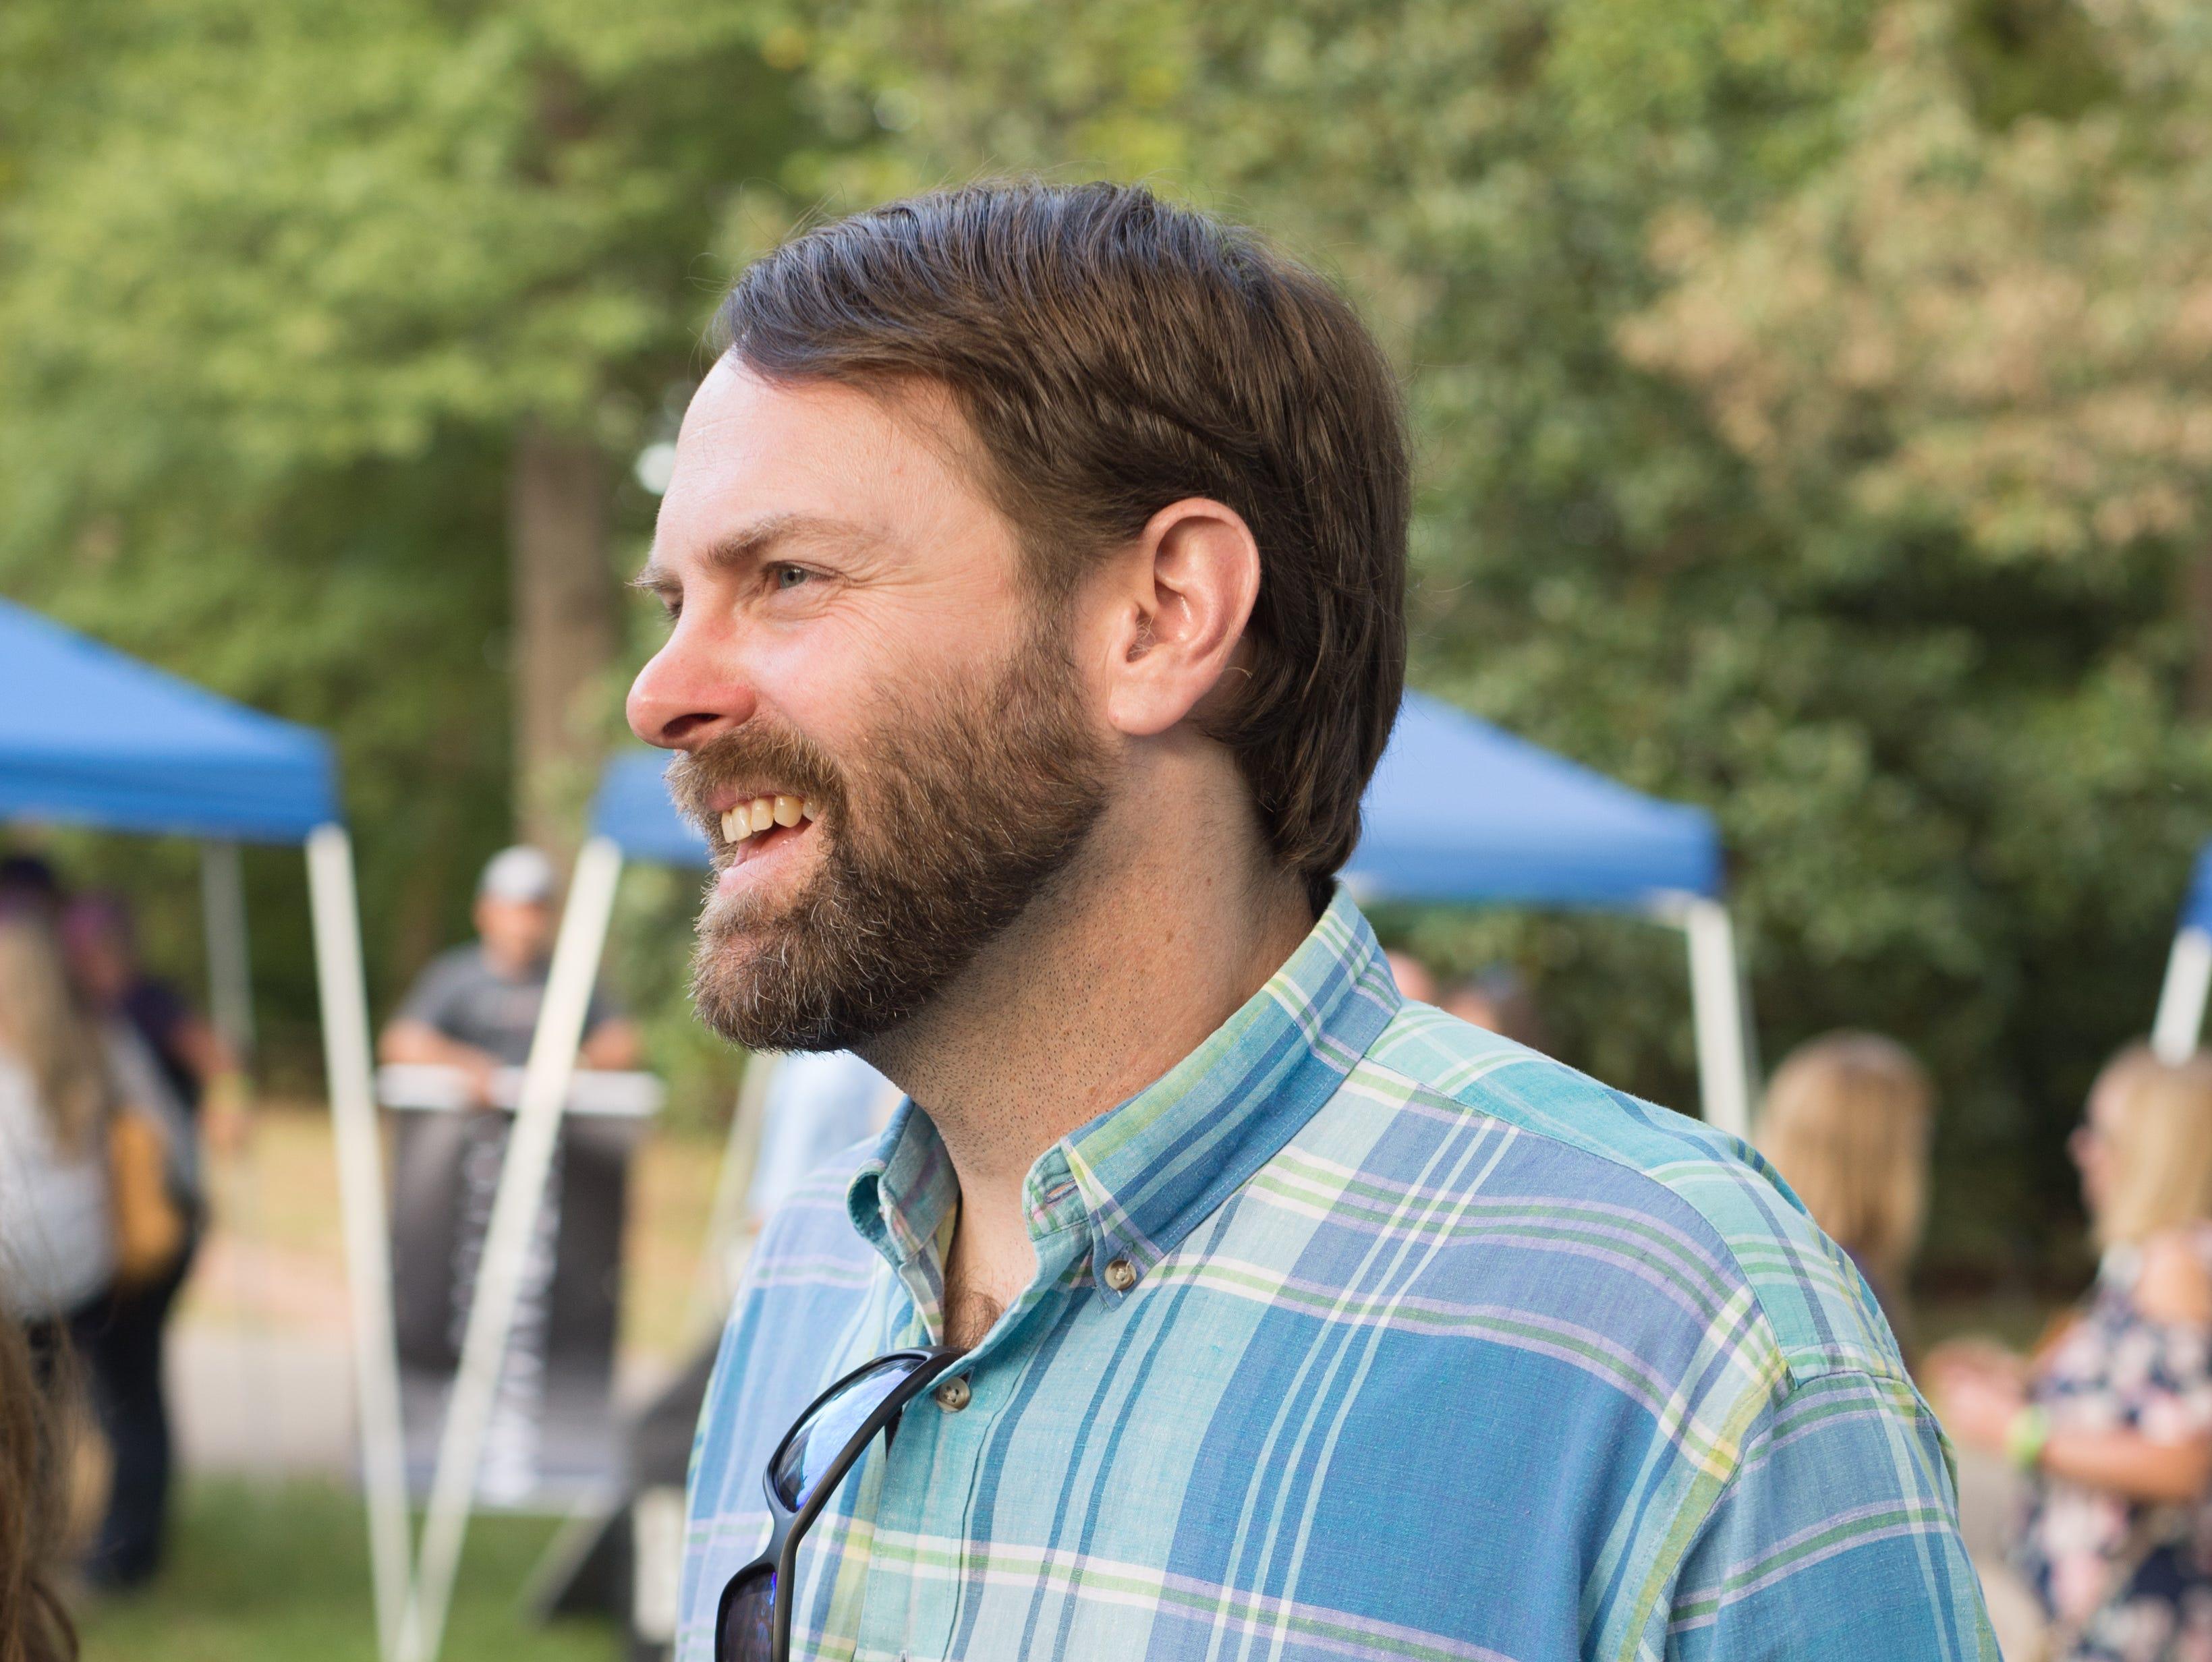 P.G. Banker enjoys Oktoberfest at Oaklands Mansion in Murfreesboro on Saturday, Sept. 29.